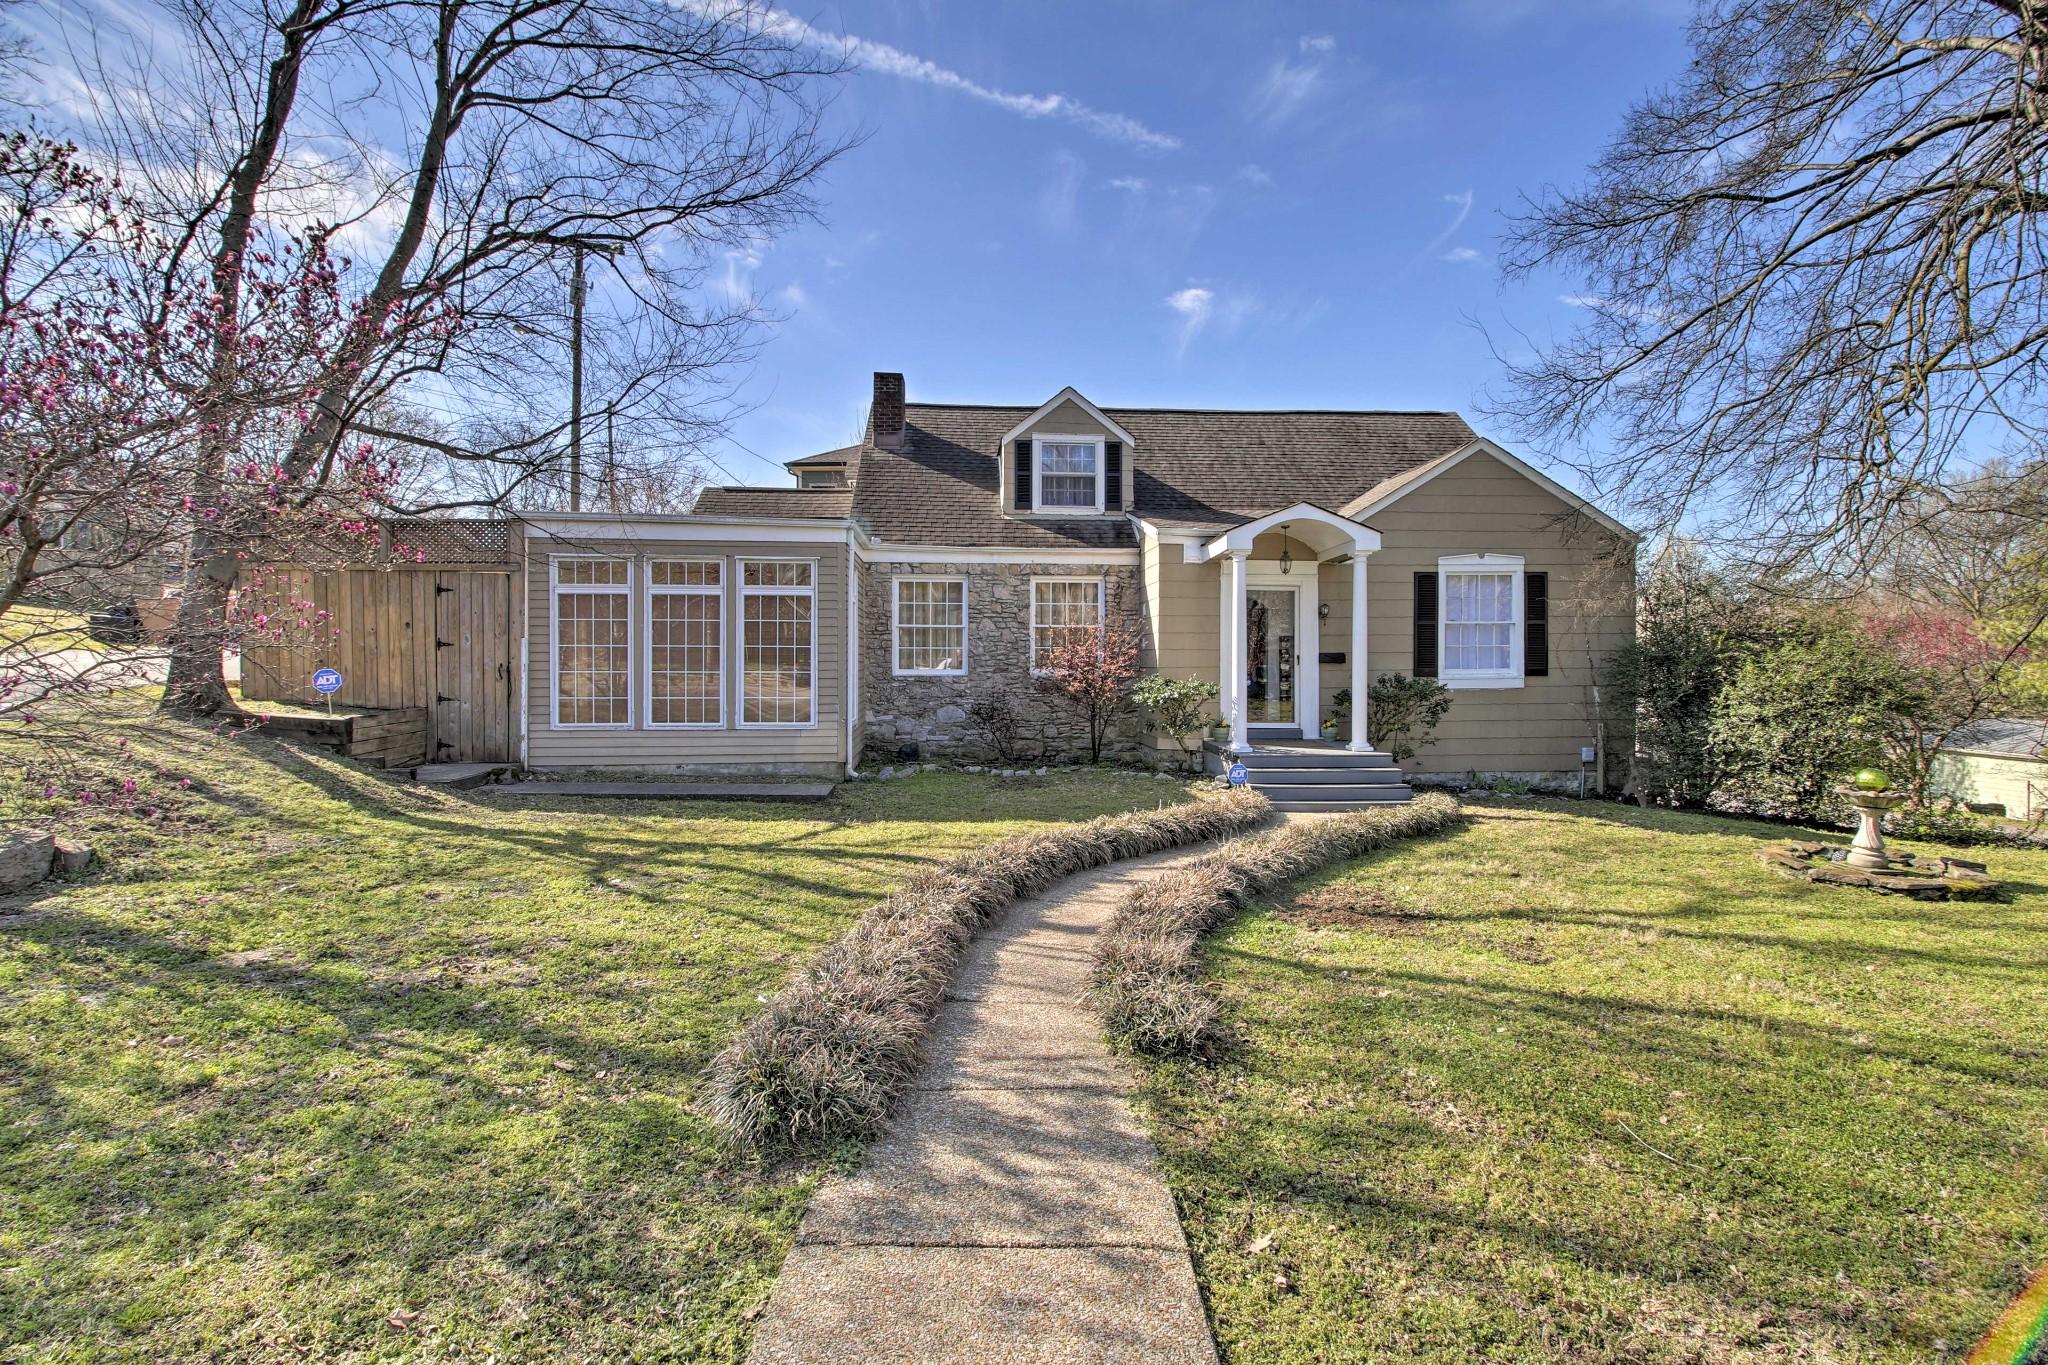 1500 Woodland St, Nashville, TN 37206 - Nashville, TN real estate listing